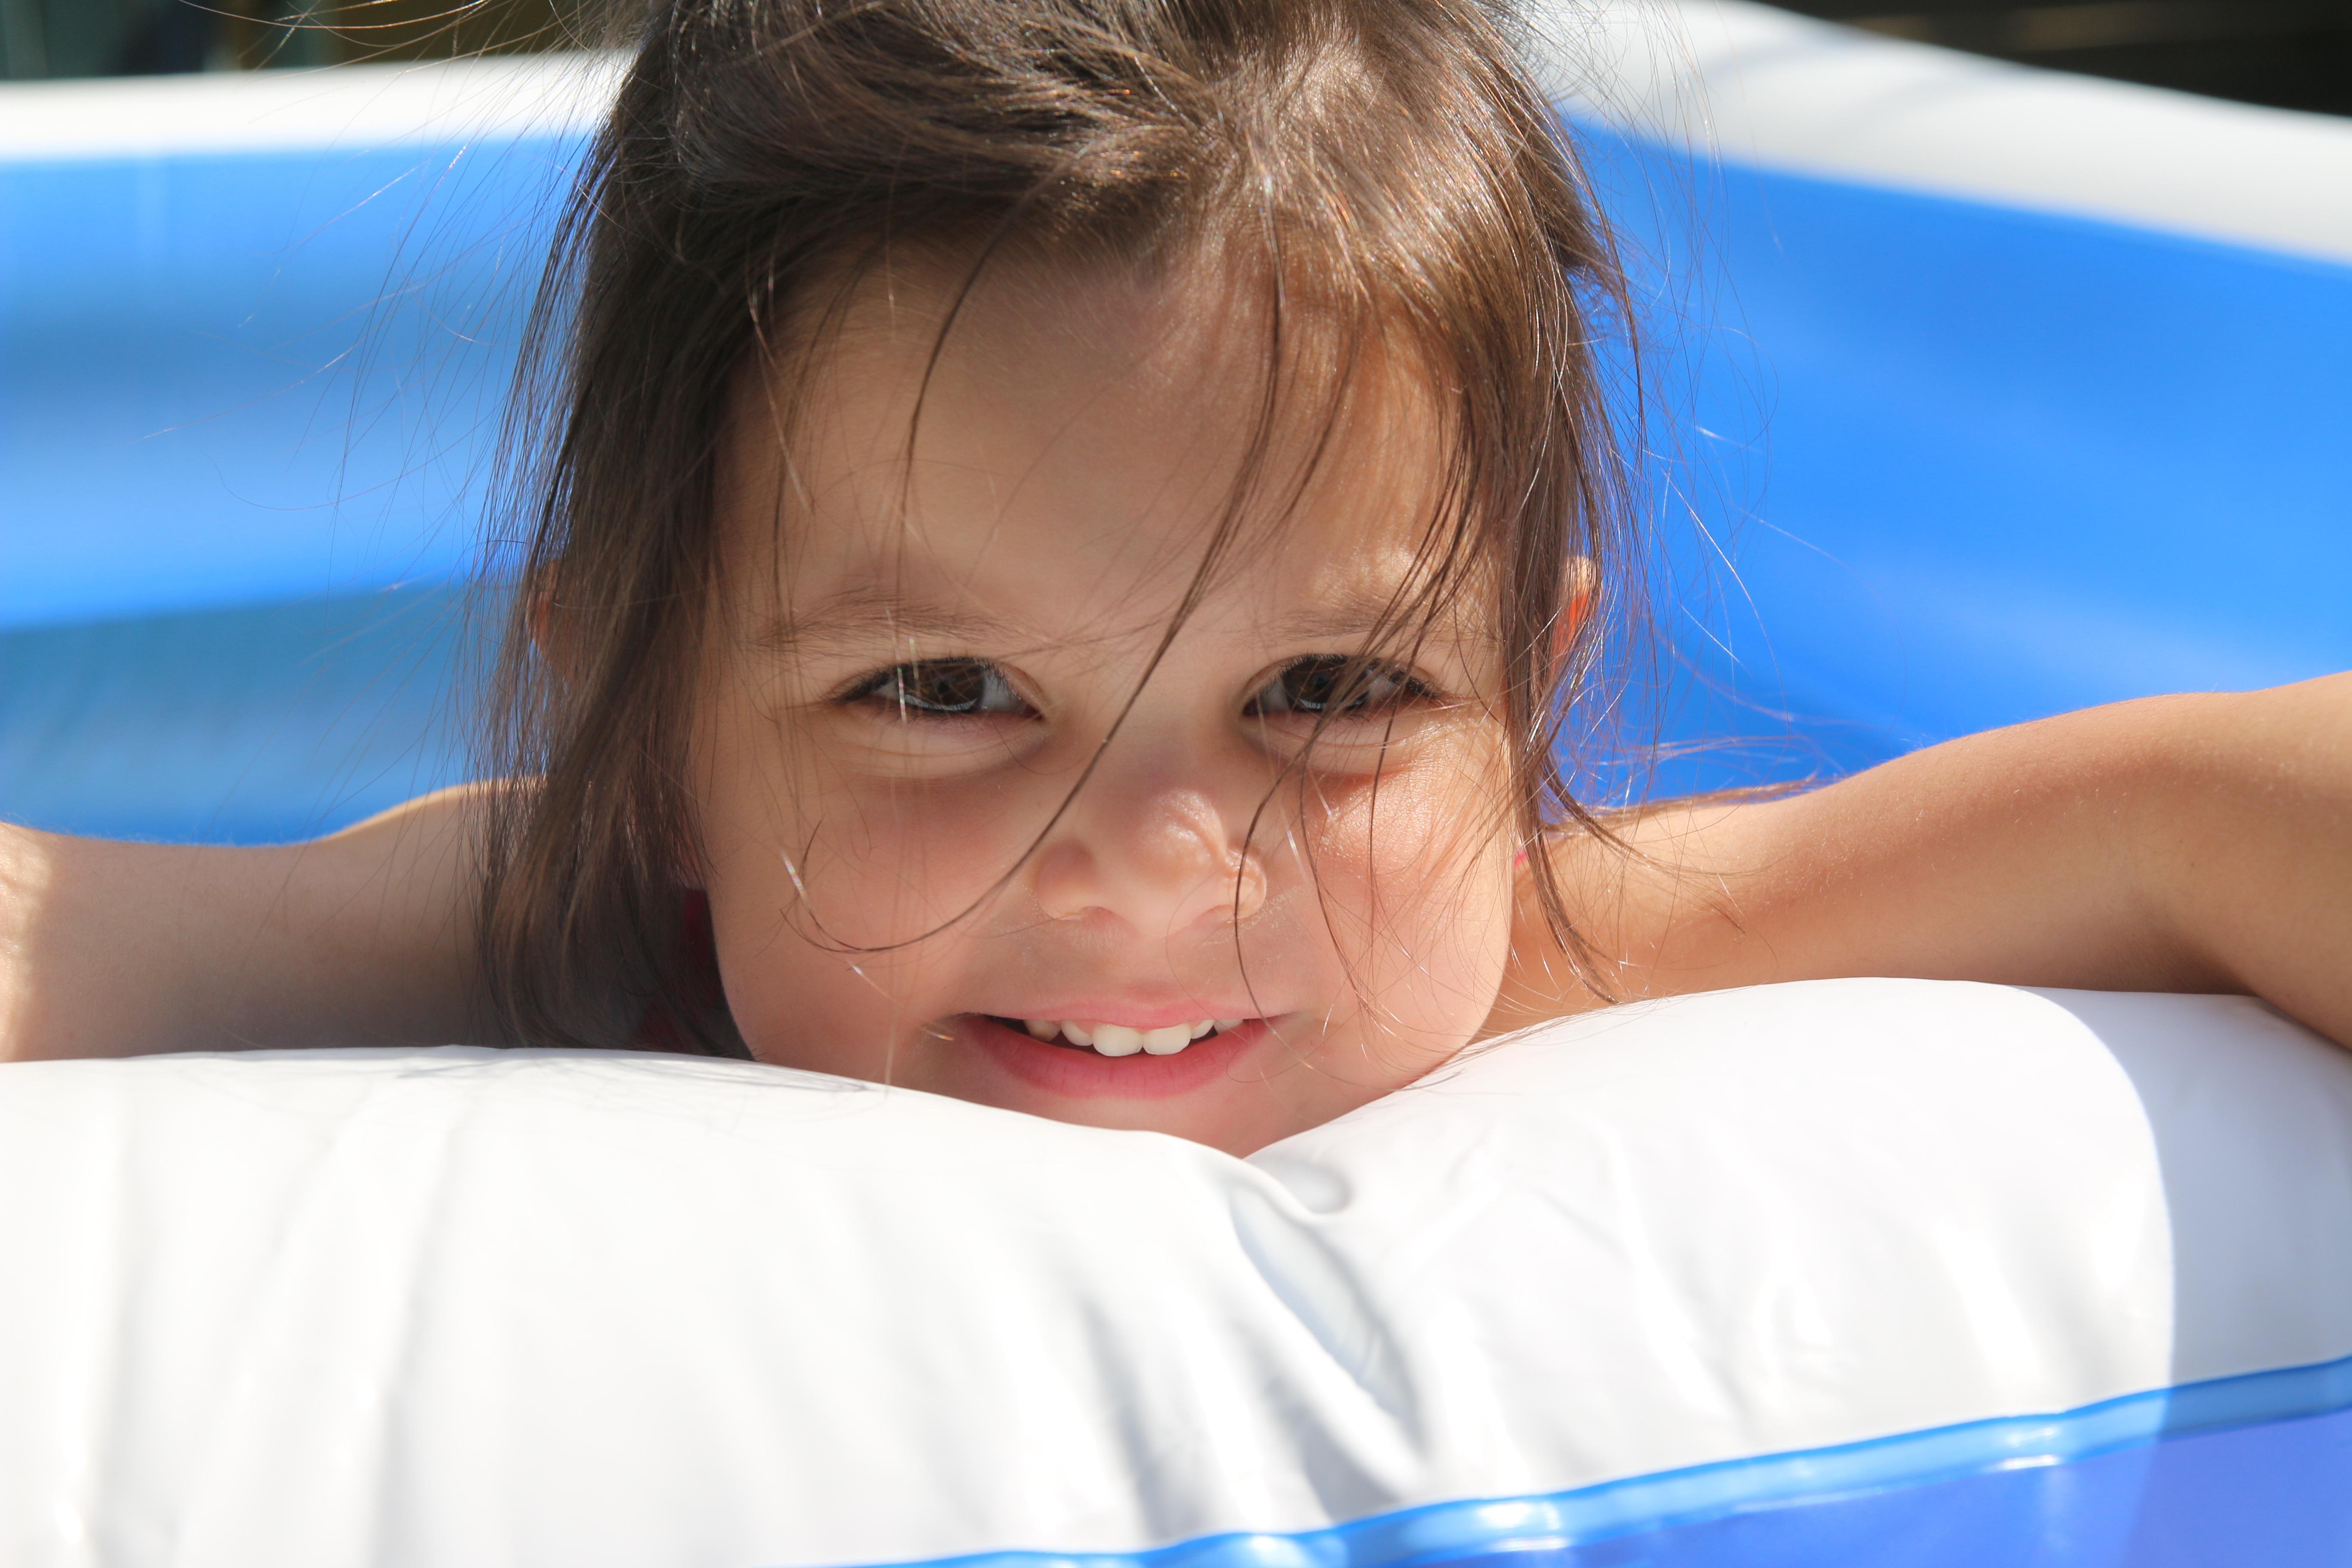 Gratis Images Person, pige, kvinde, Hair, Hvid, Kid, Cute-7665